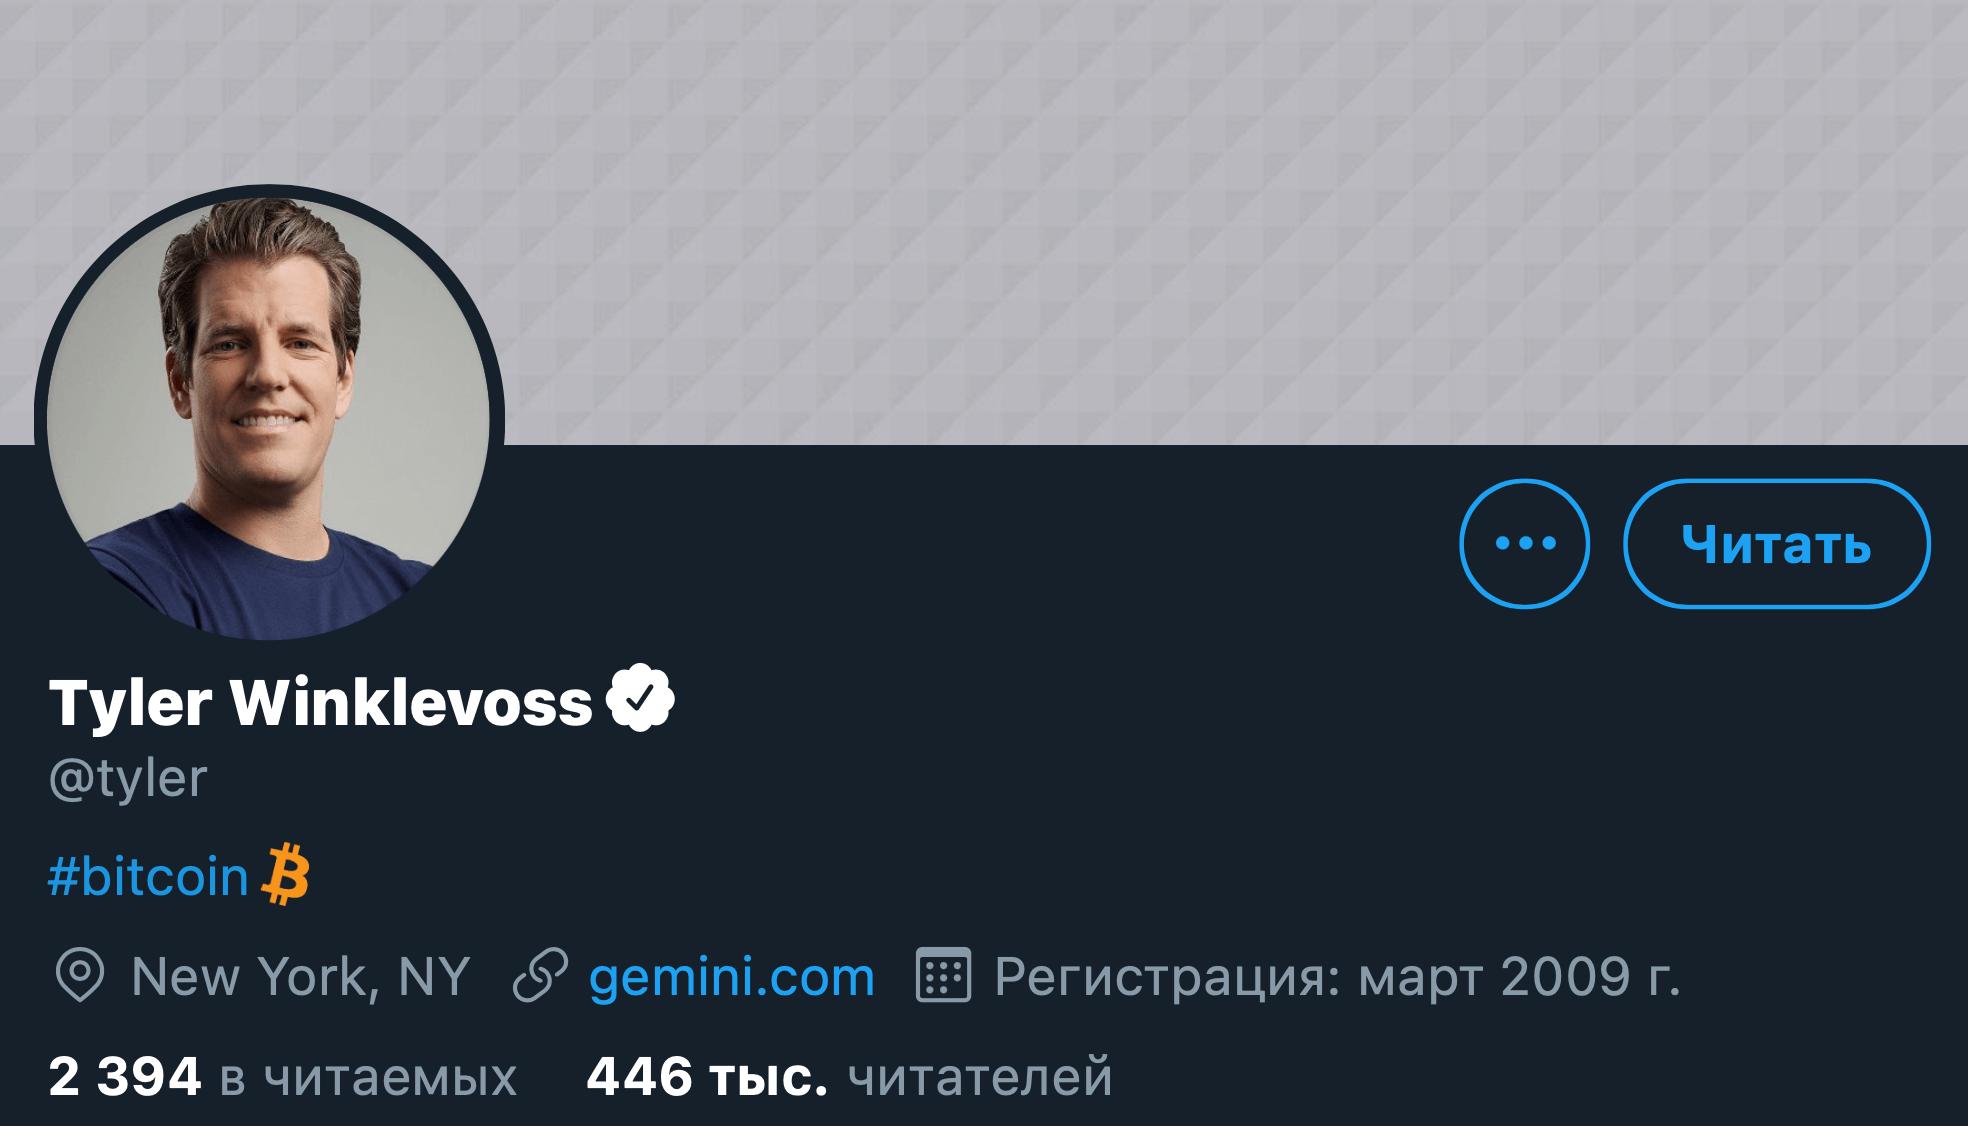 твиттер Уинклвосс